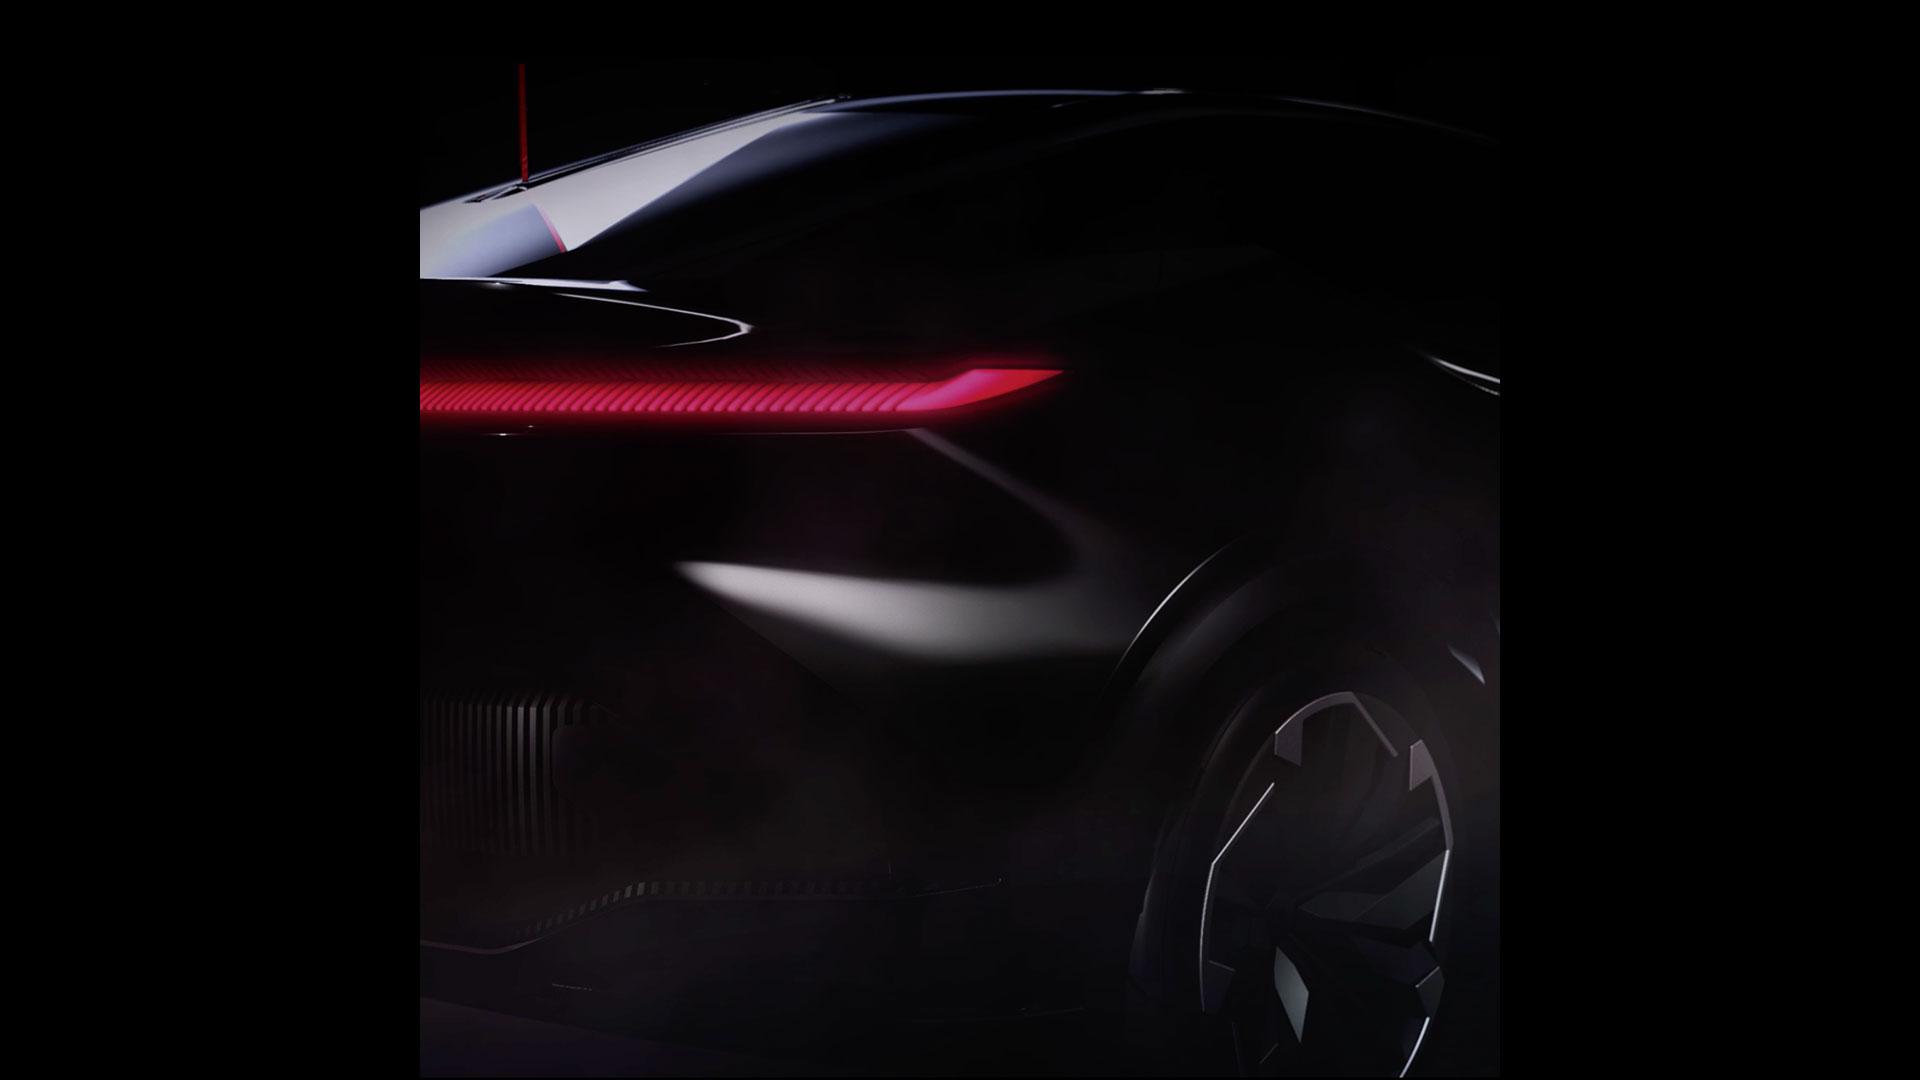 2021 lexus concept car gallery 01